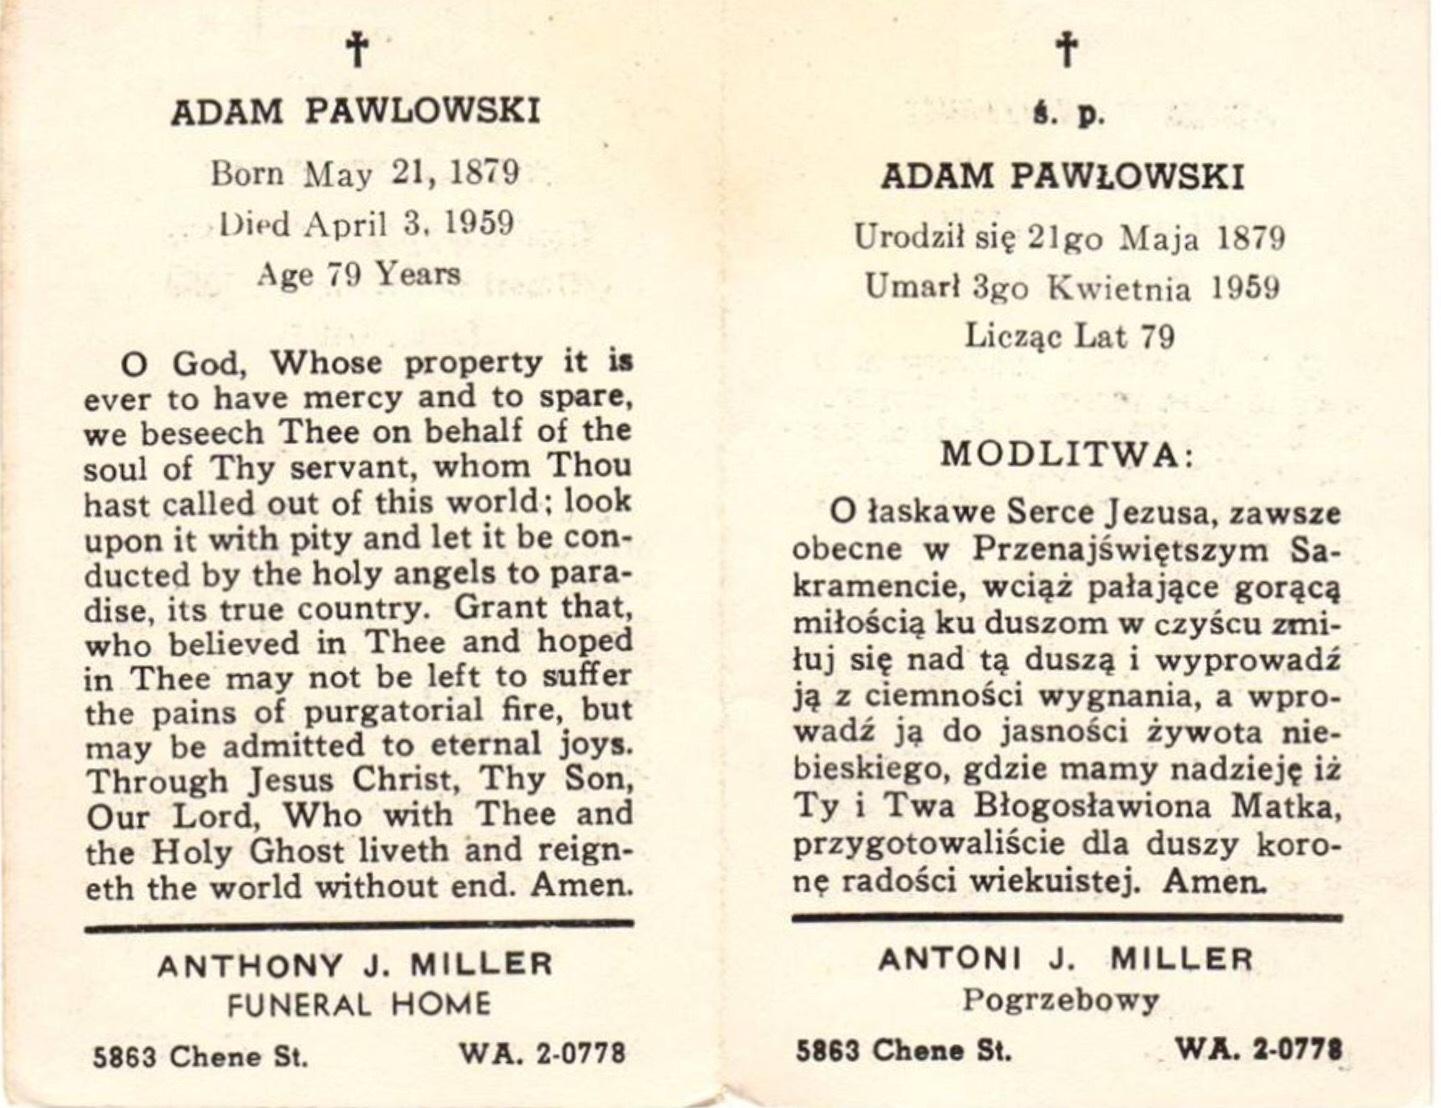 Adam Pawlowski Prayer Card.jpg